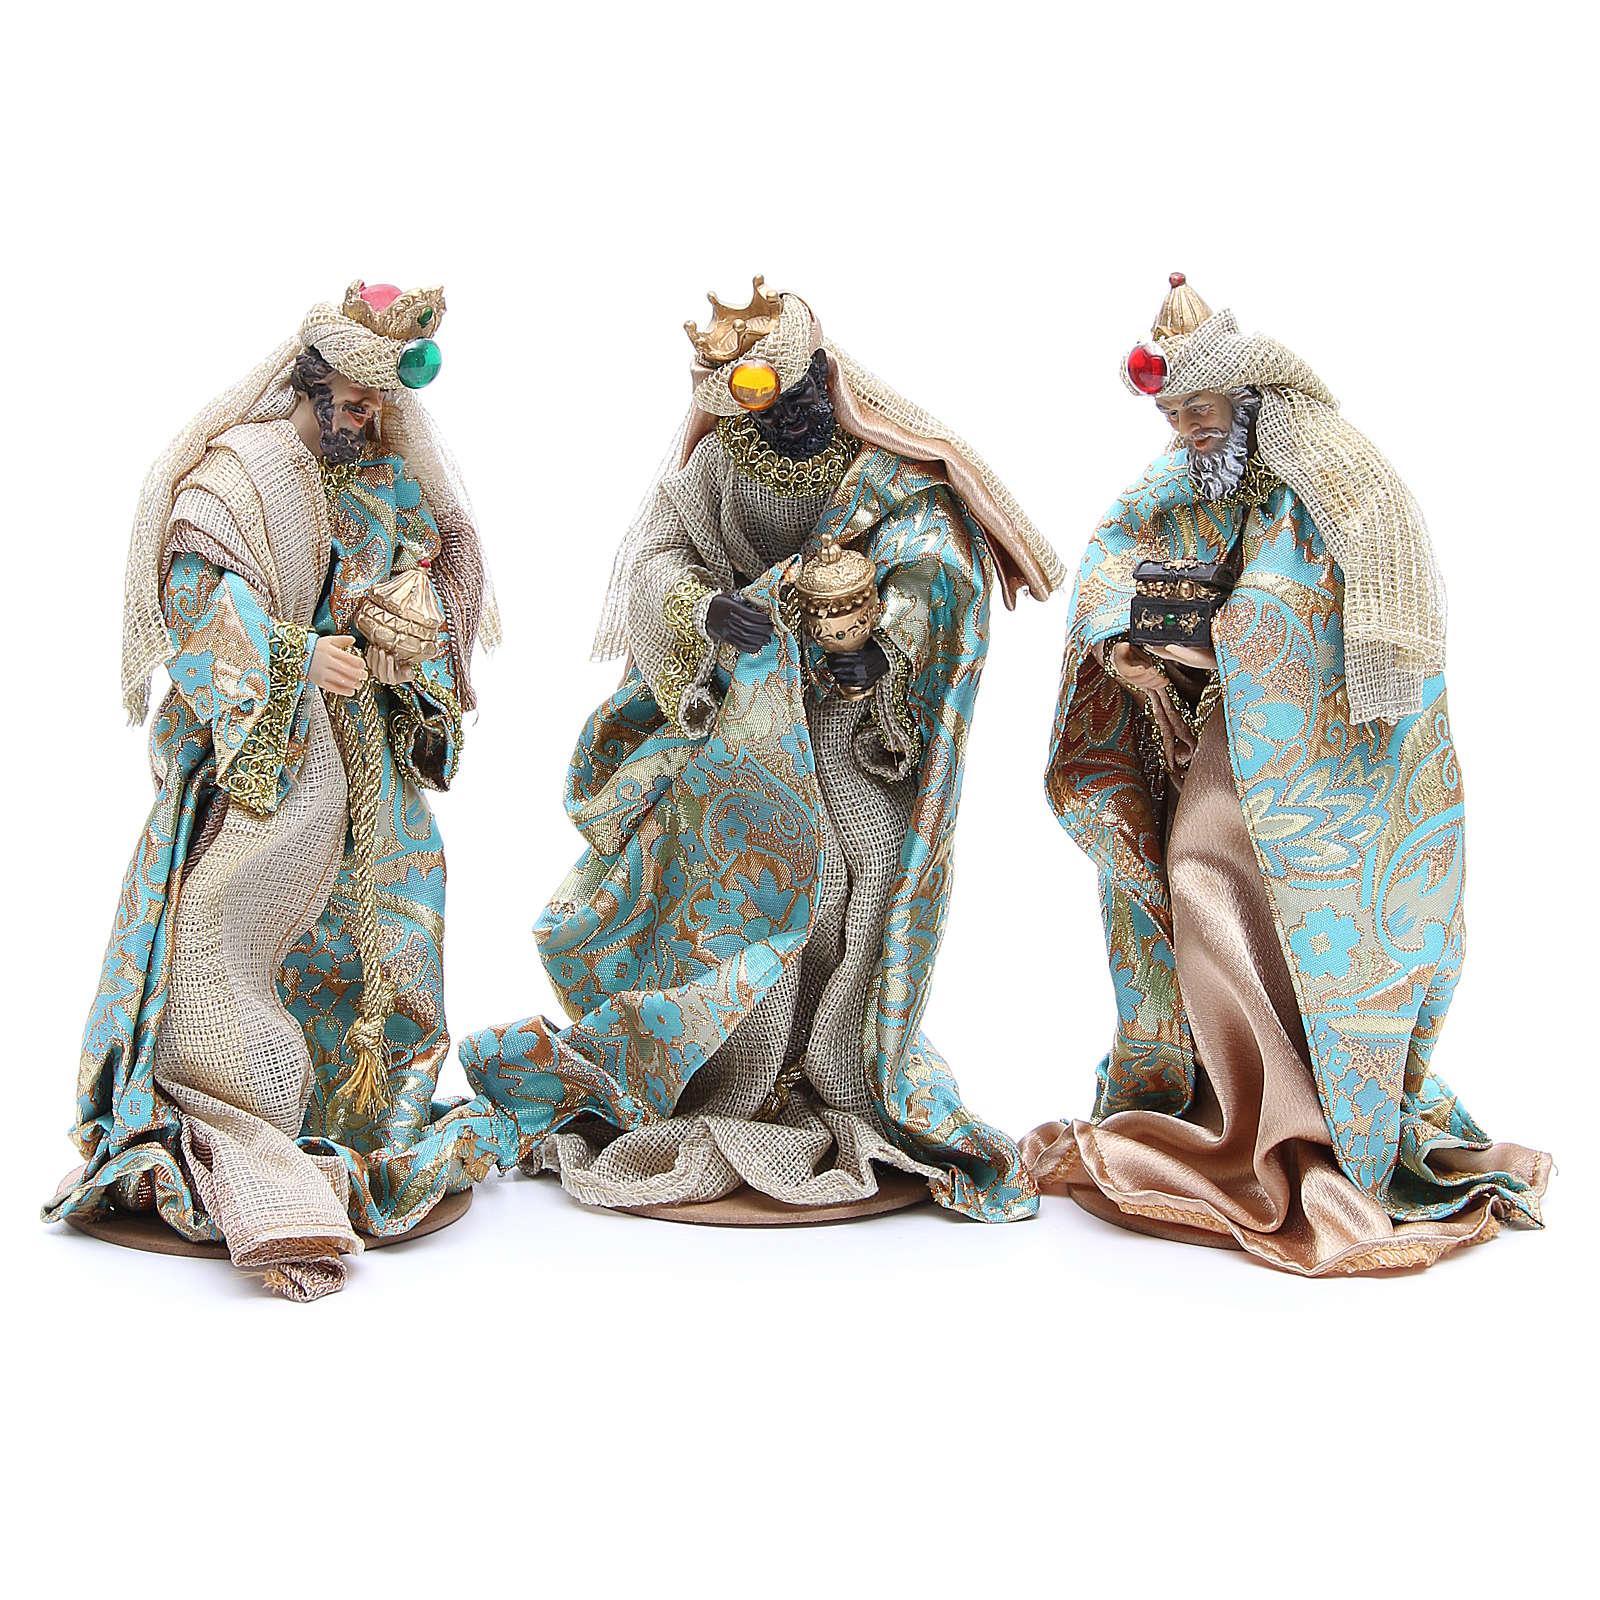 Nativity set in resin, 10 figurines measuring 25cm 4